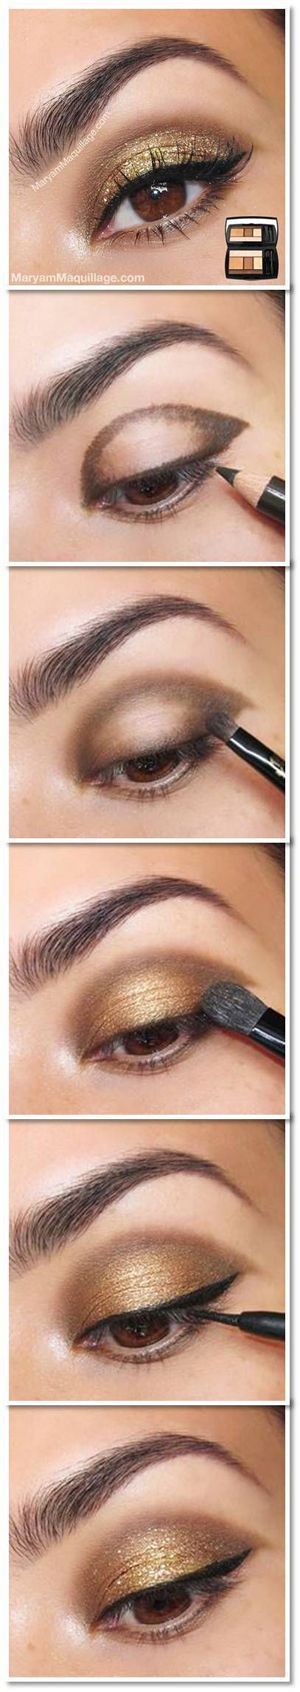 Holiday Gold Glitter Eye Makeup. Beauty Tips & Trips.